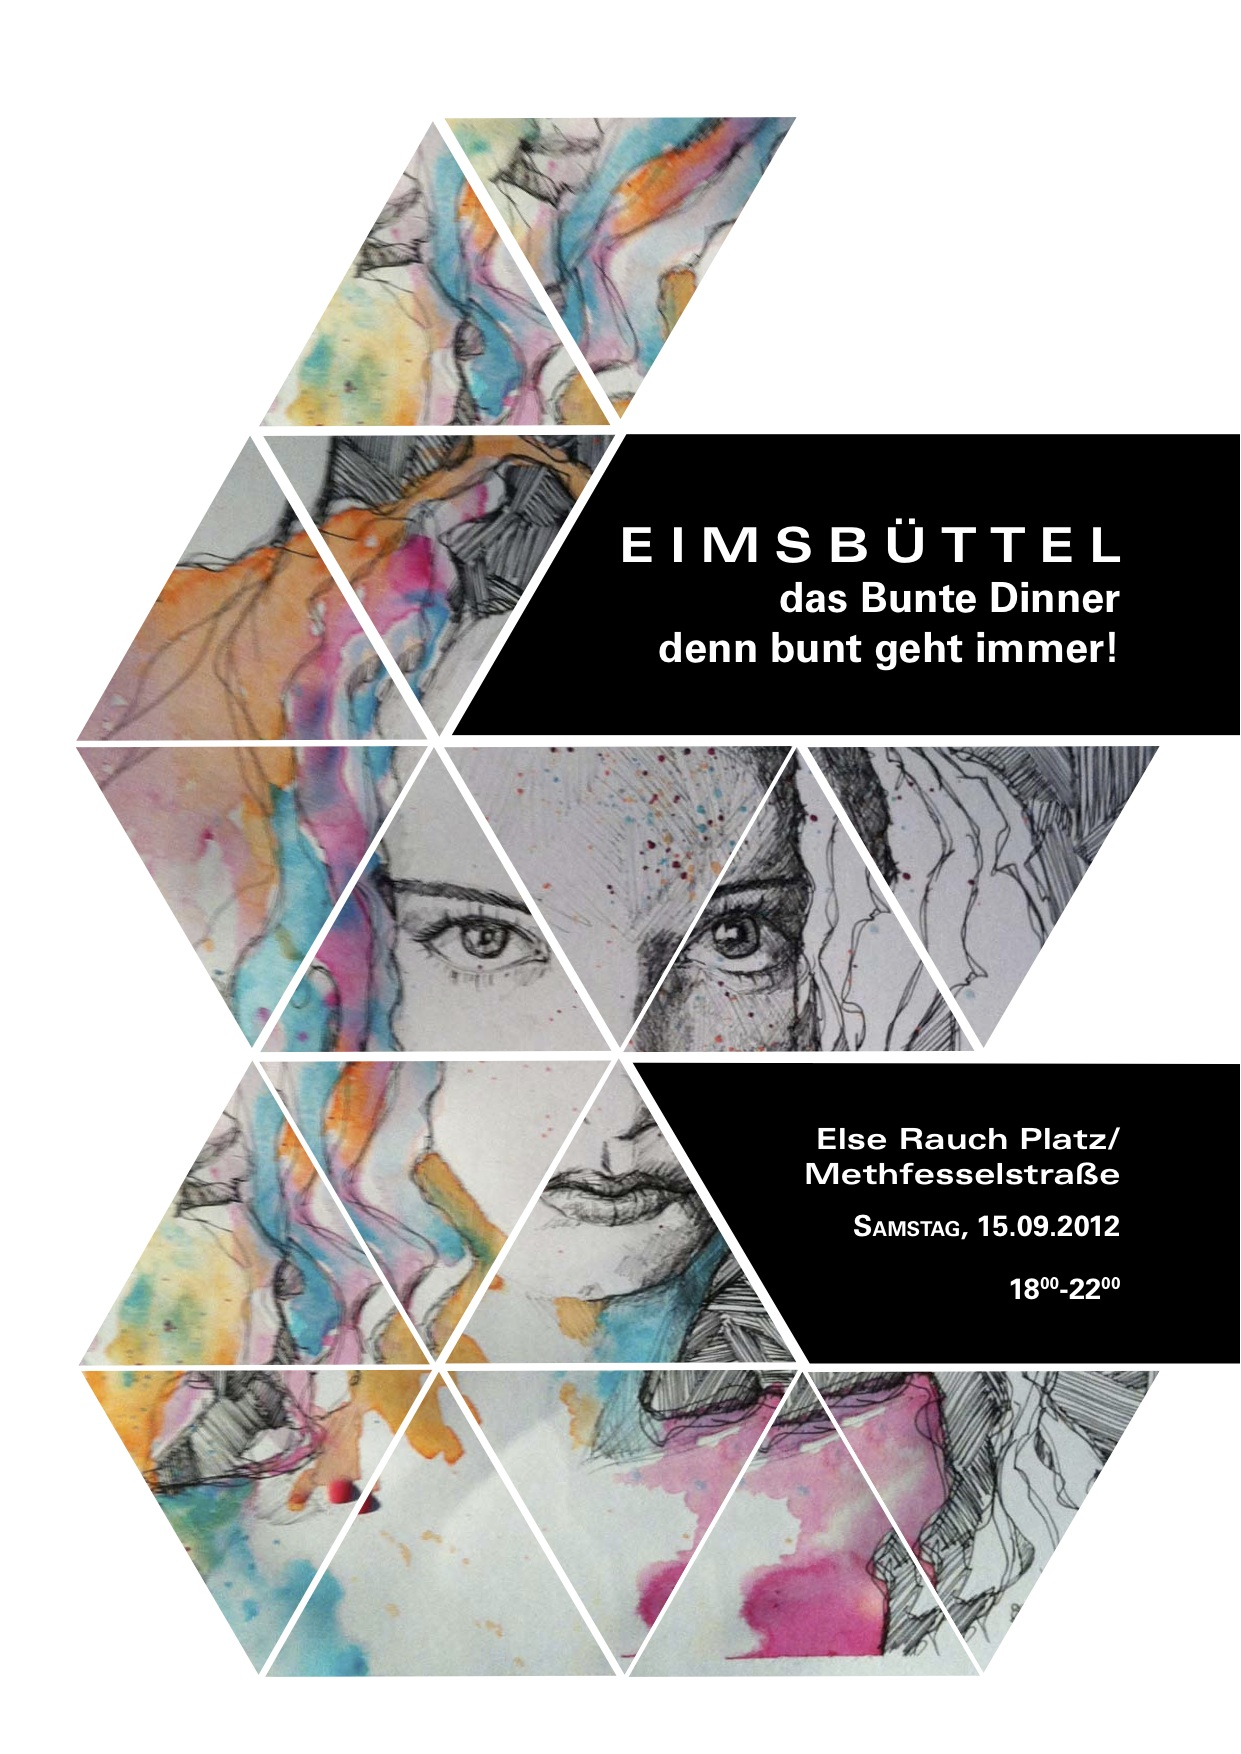 Buntes Dinner Eimsbüttel